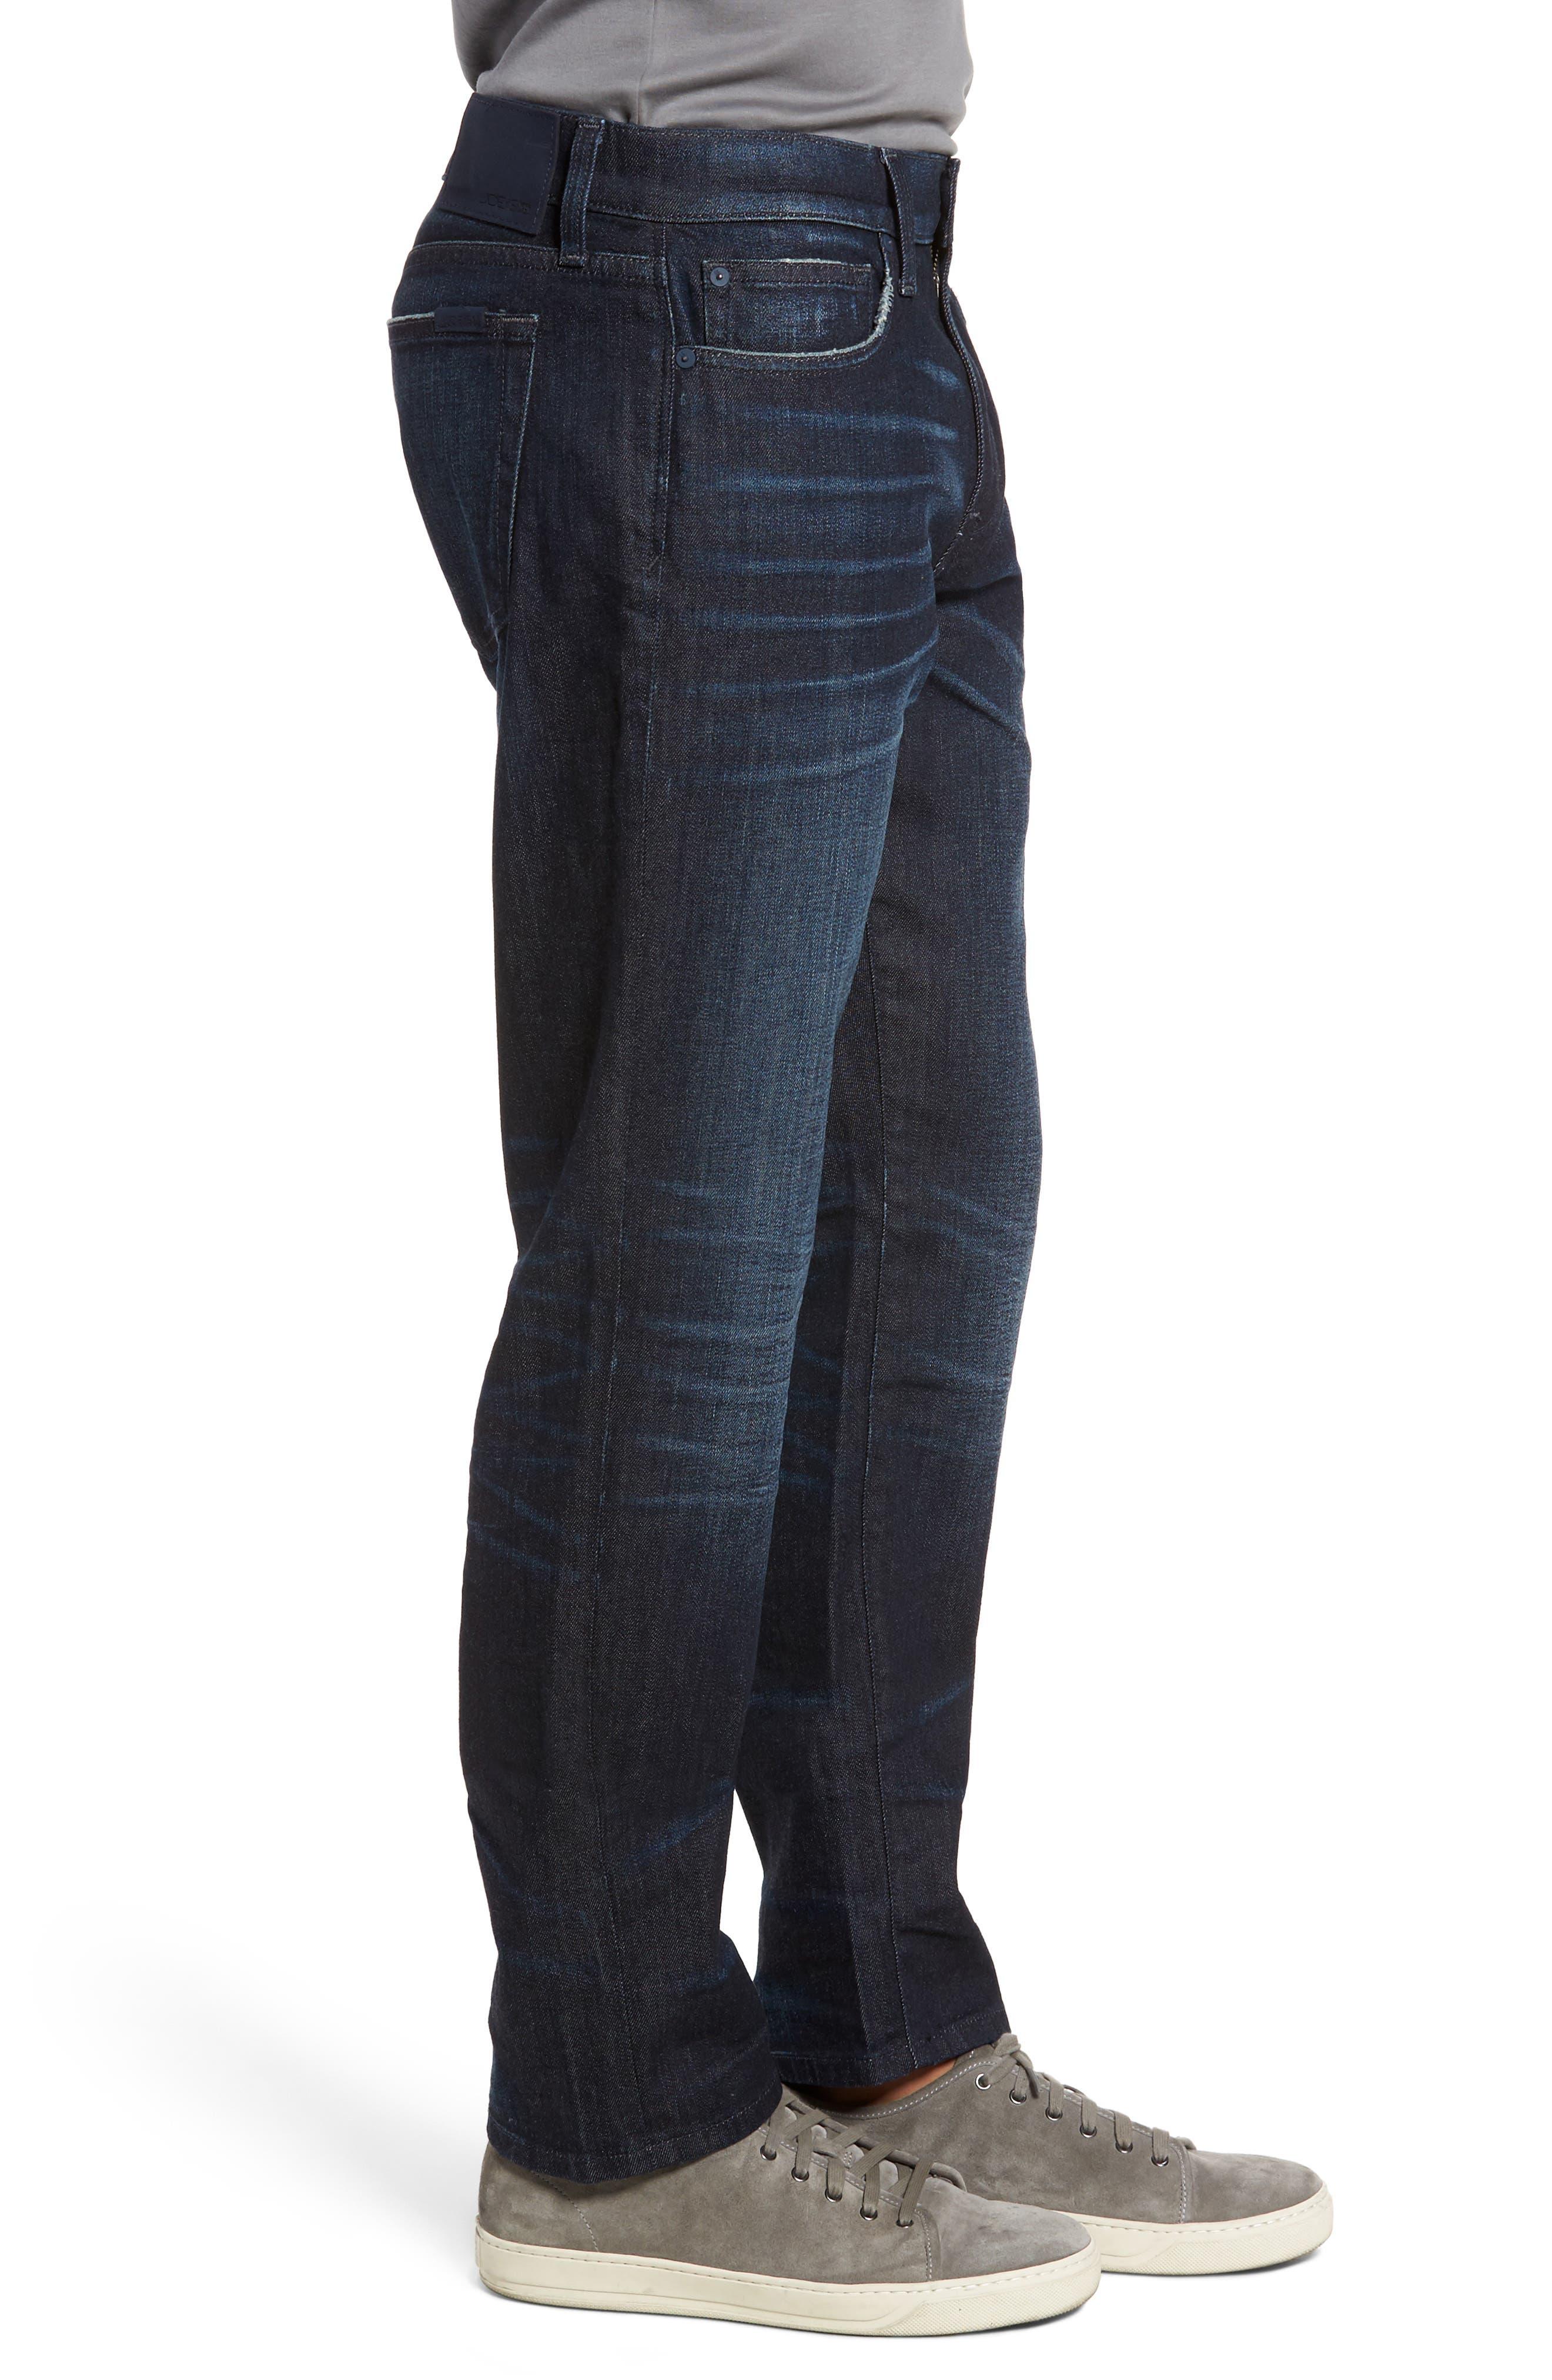 Brixton Slim Straight Fit Jeans,                             Alternate thumbnail 3, color,                             405